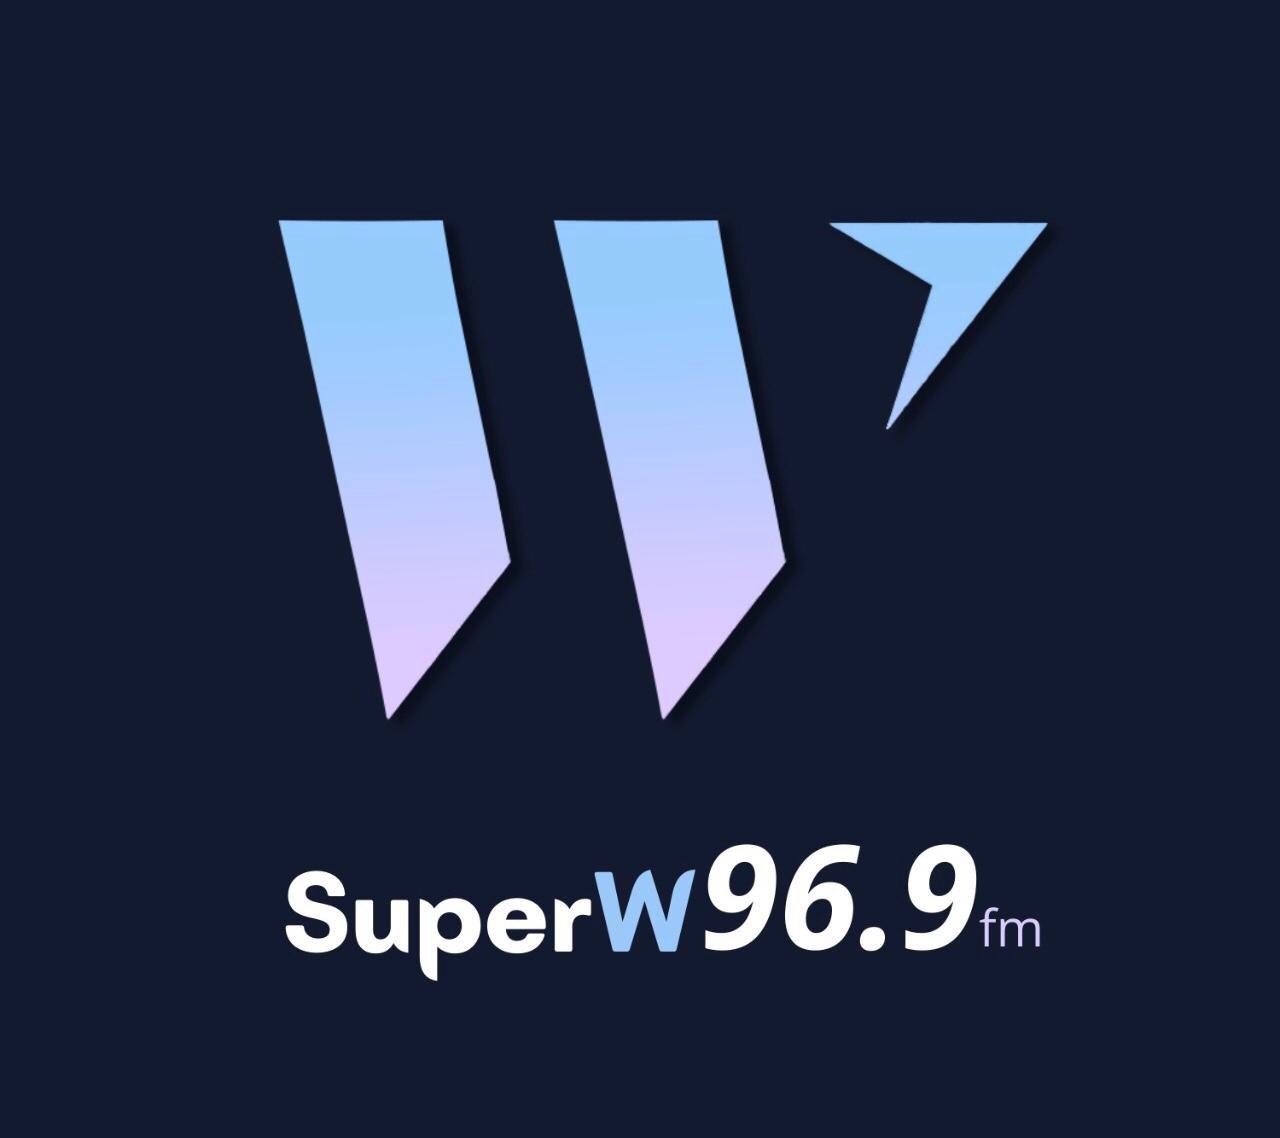 Radio Super W 96.9 FM